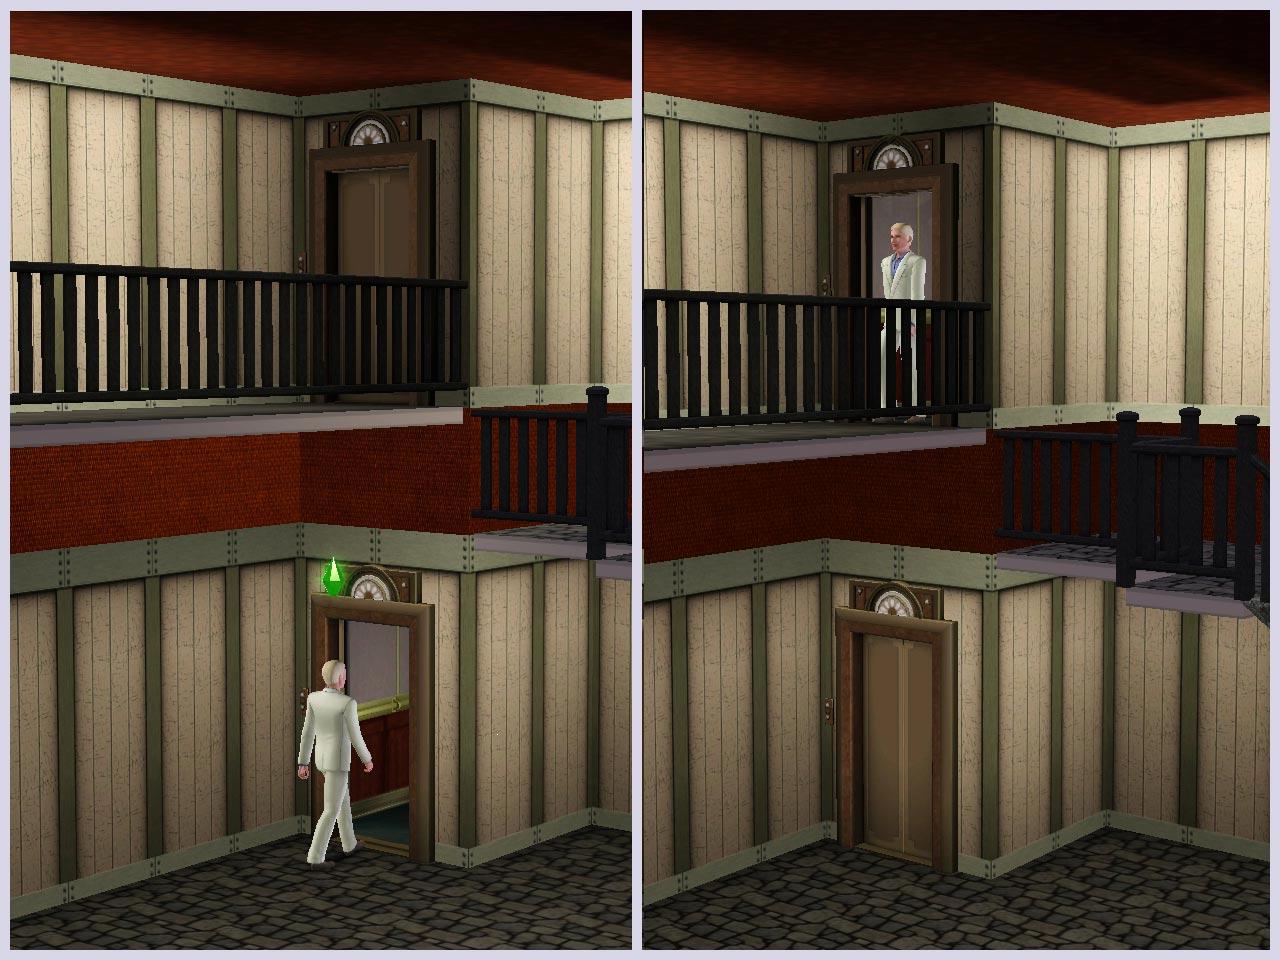 sims 3 elevator mod